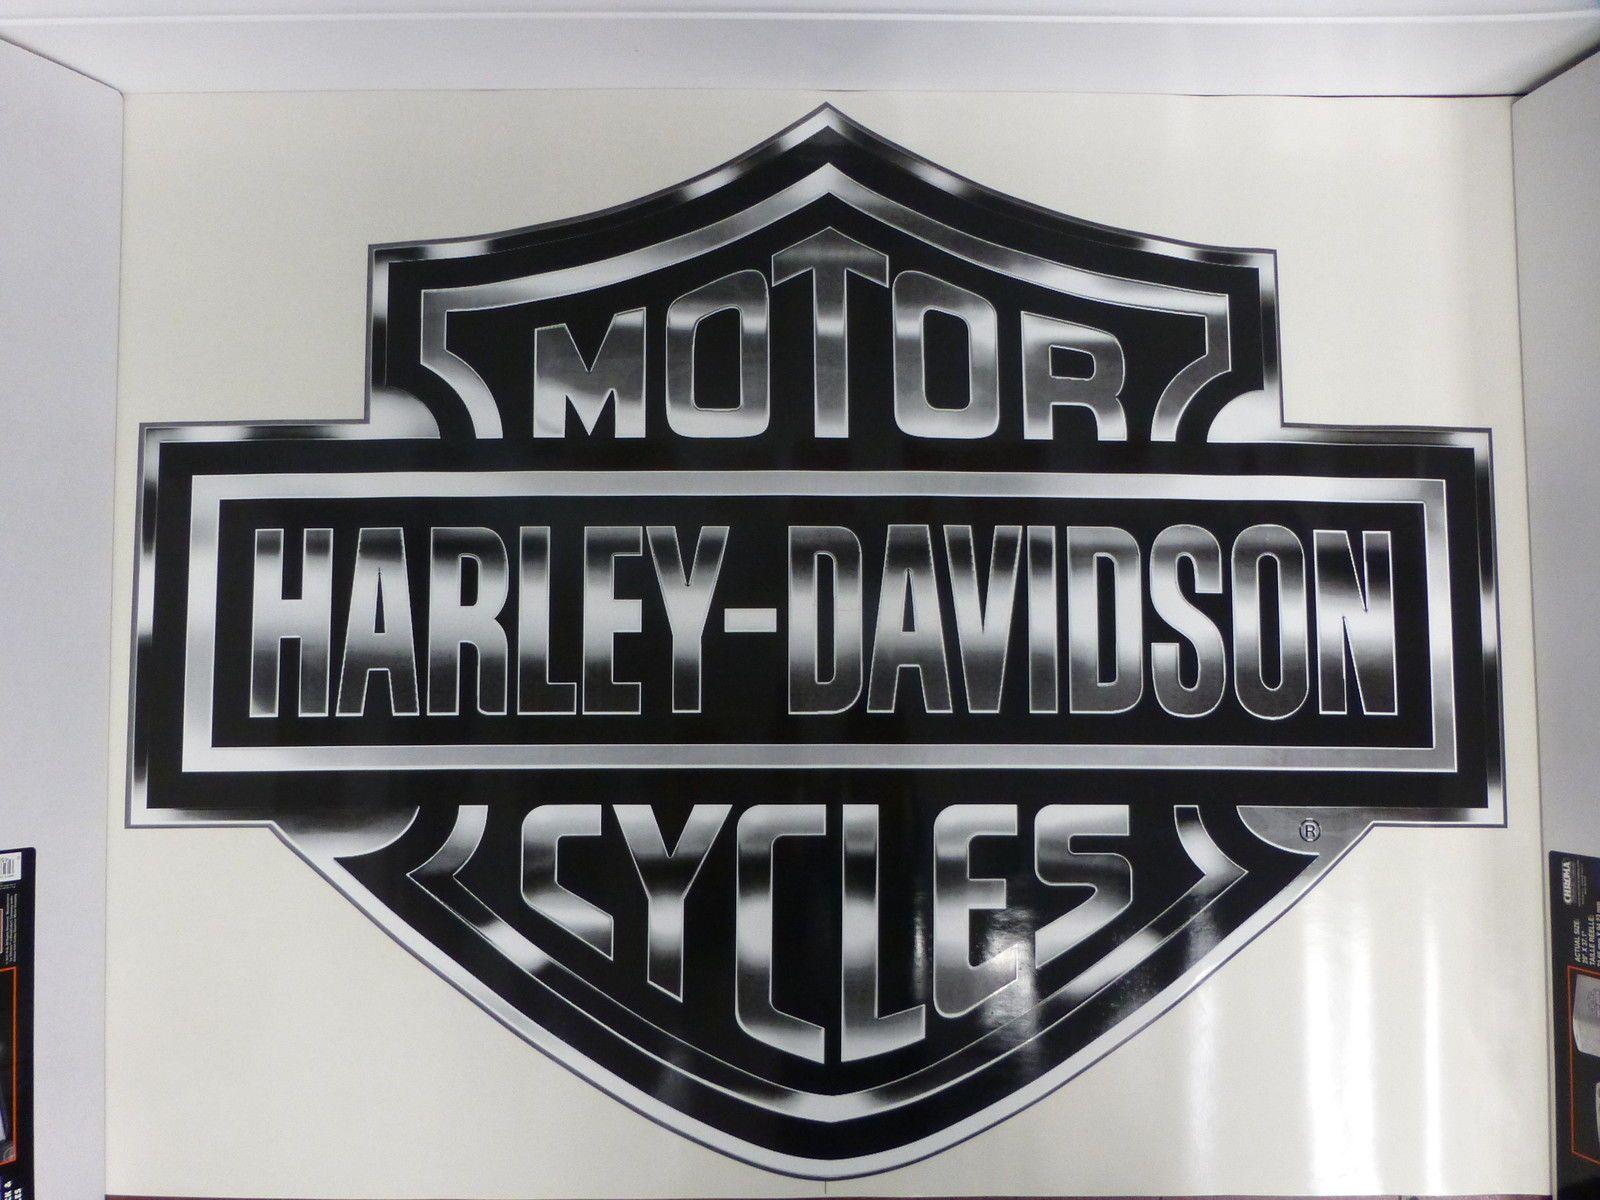 Harley Davidson Bar Shield Extra Large Trailer Decal Sticker New Harley Davidson Harley Decals Stickers [ 1200 x 1600 Pixel ]